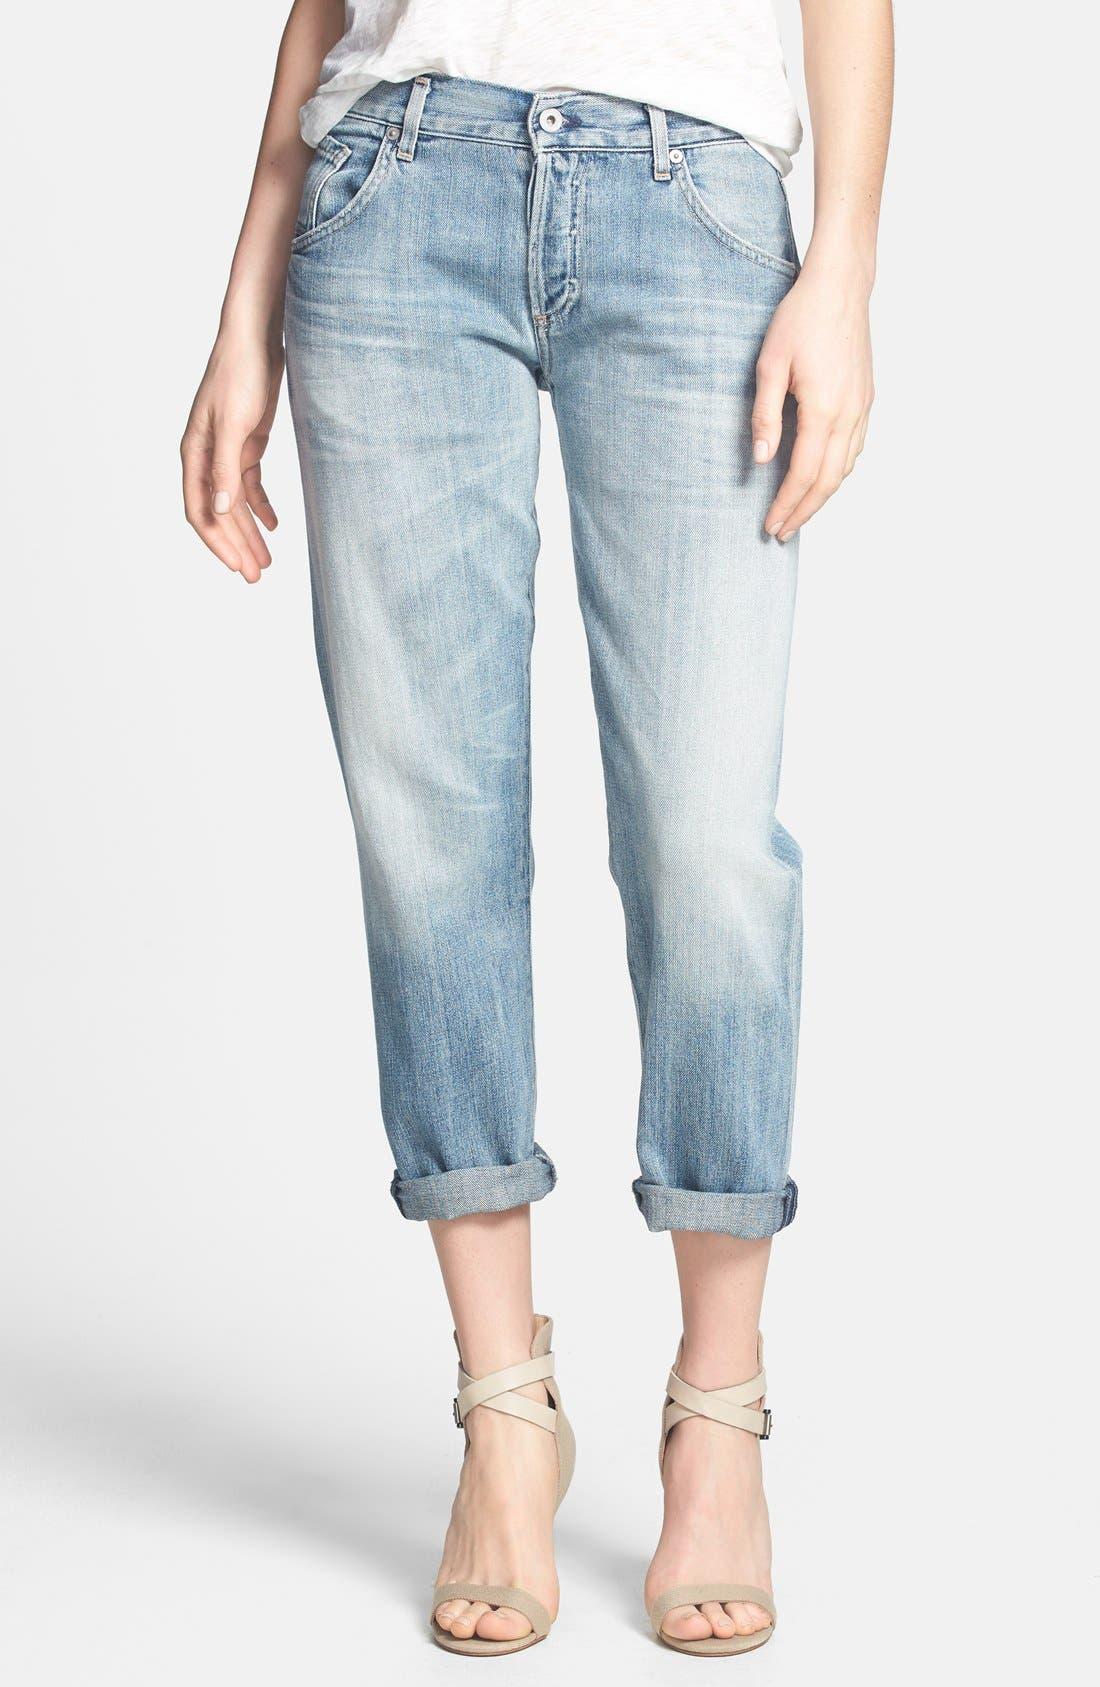 Alternate Image 1 Selected - Citizens of Humanity 'Premium Vintage - Skyler' Boyfriend Crop Jeans (Archive)